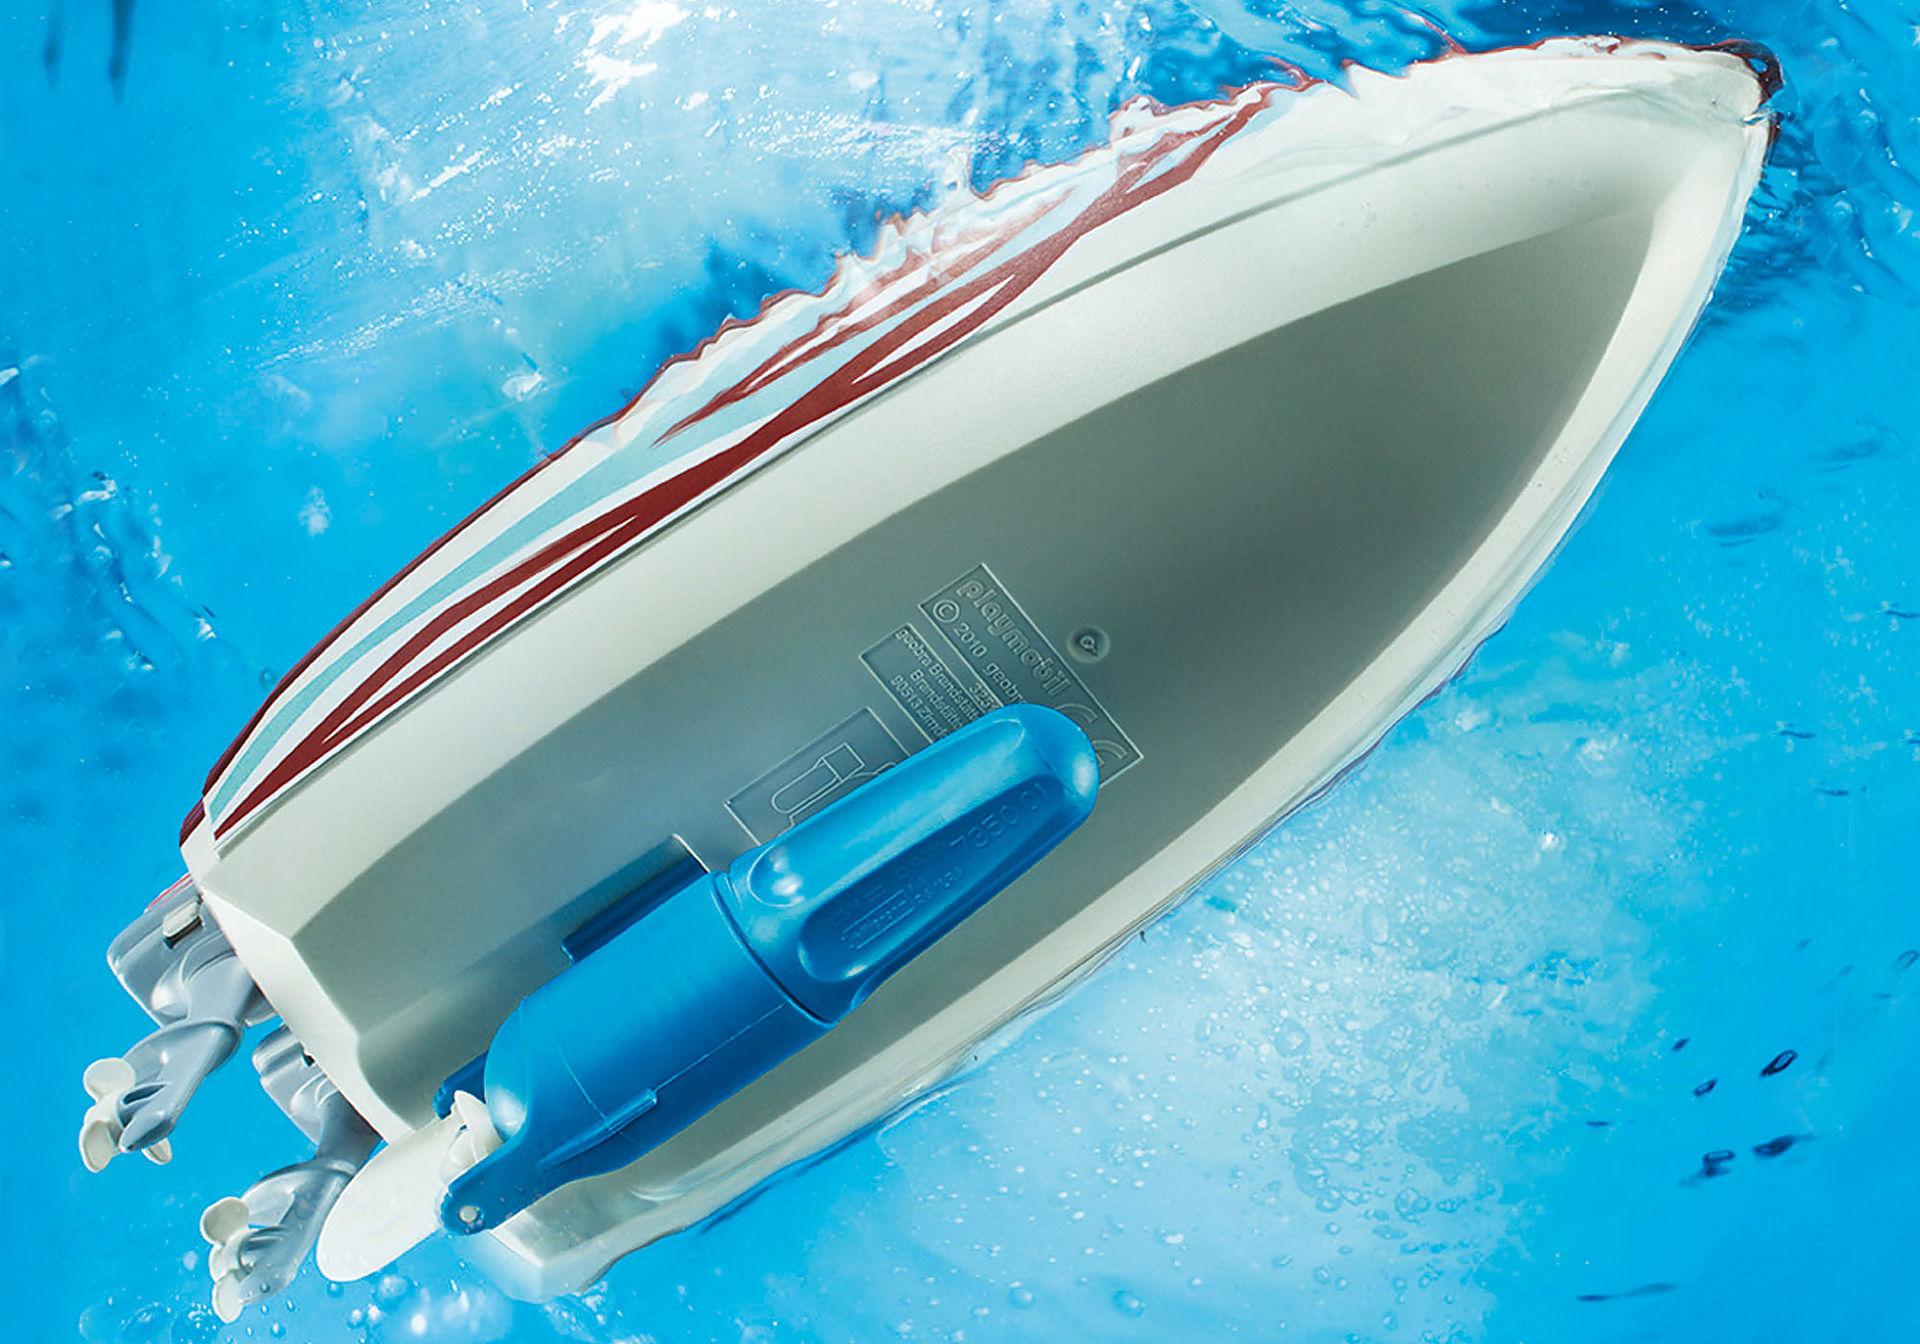 9428 Lancha Motora con motor submarino zoom image5